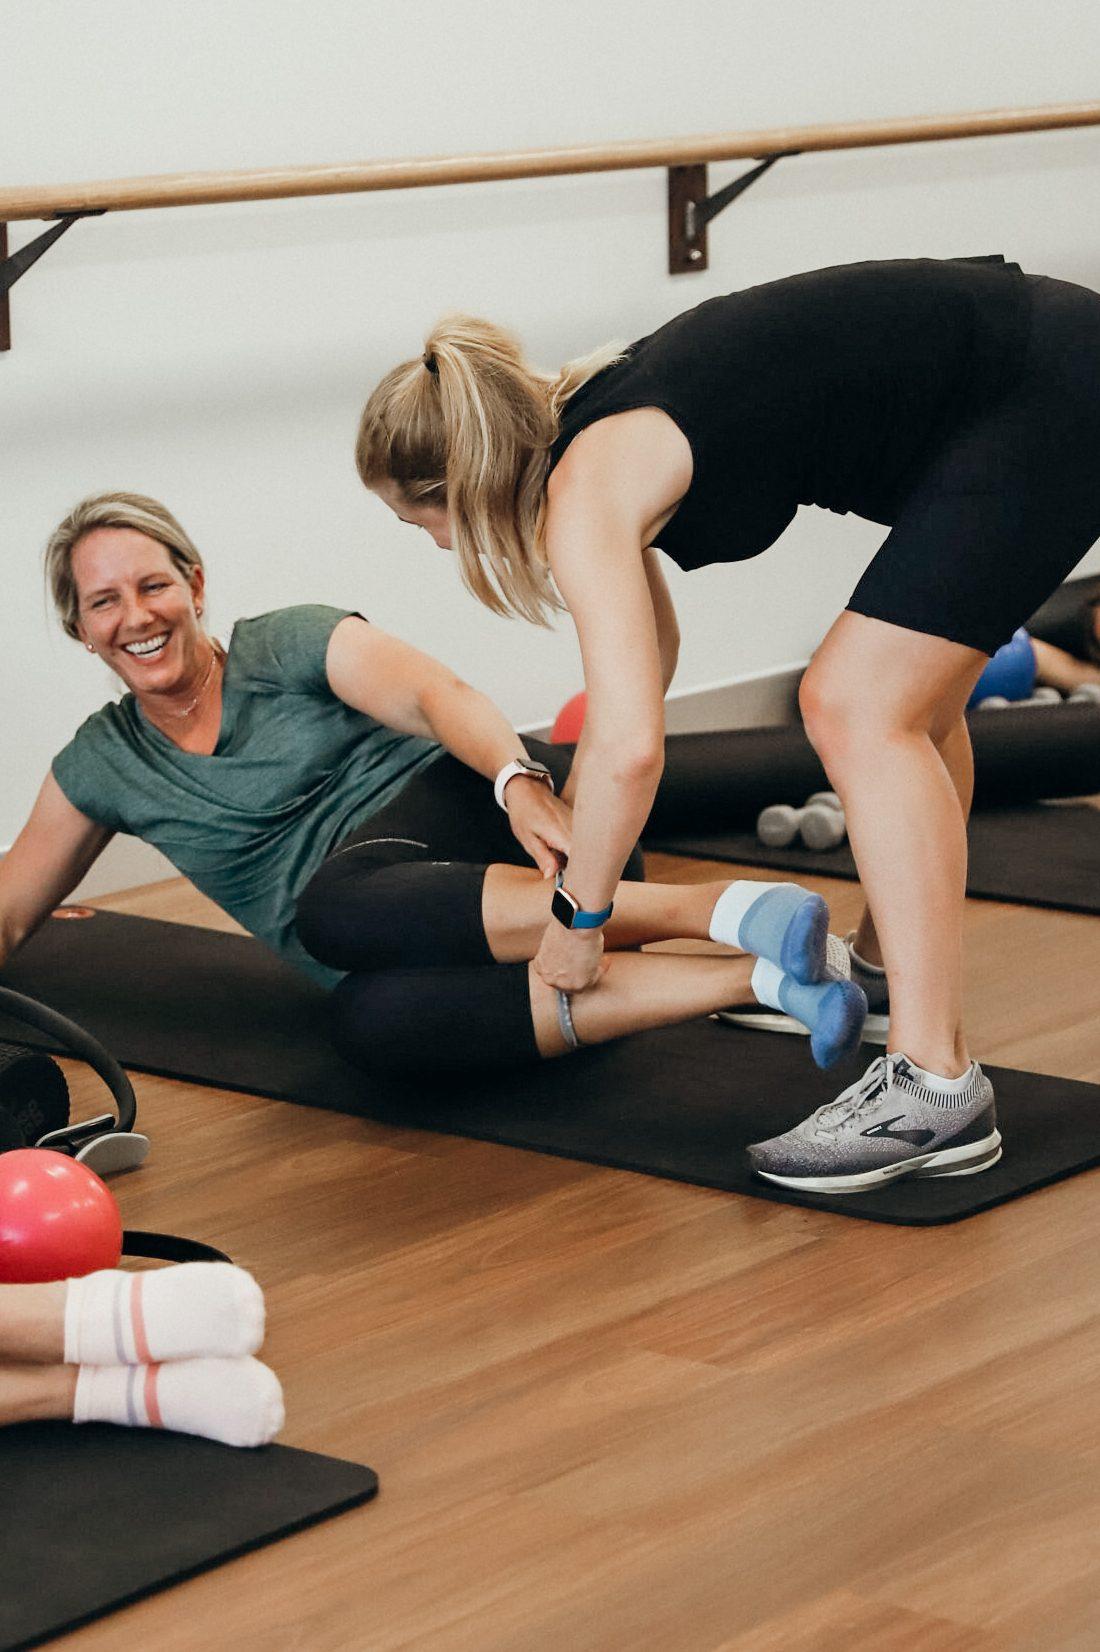 Pilates instructor teacher corrects student